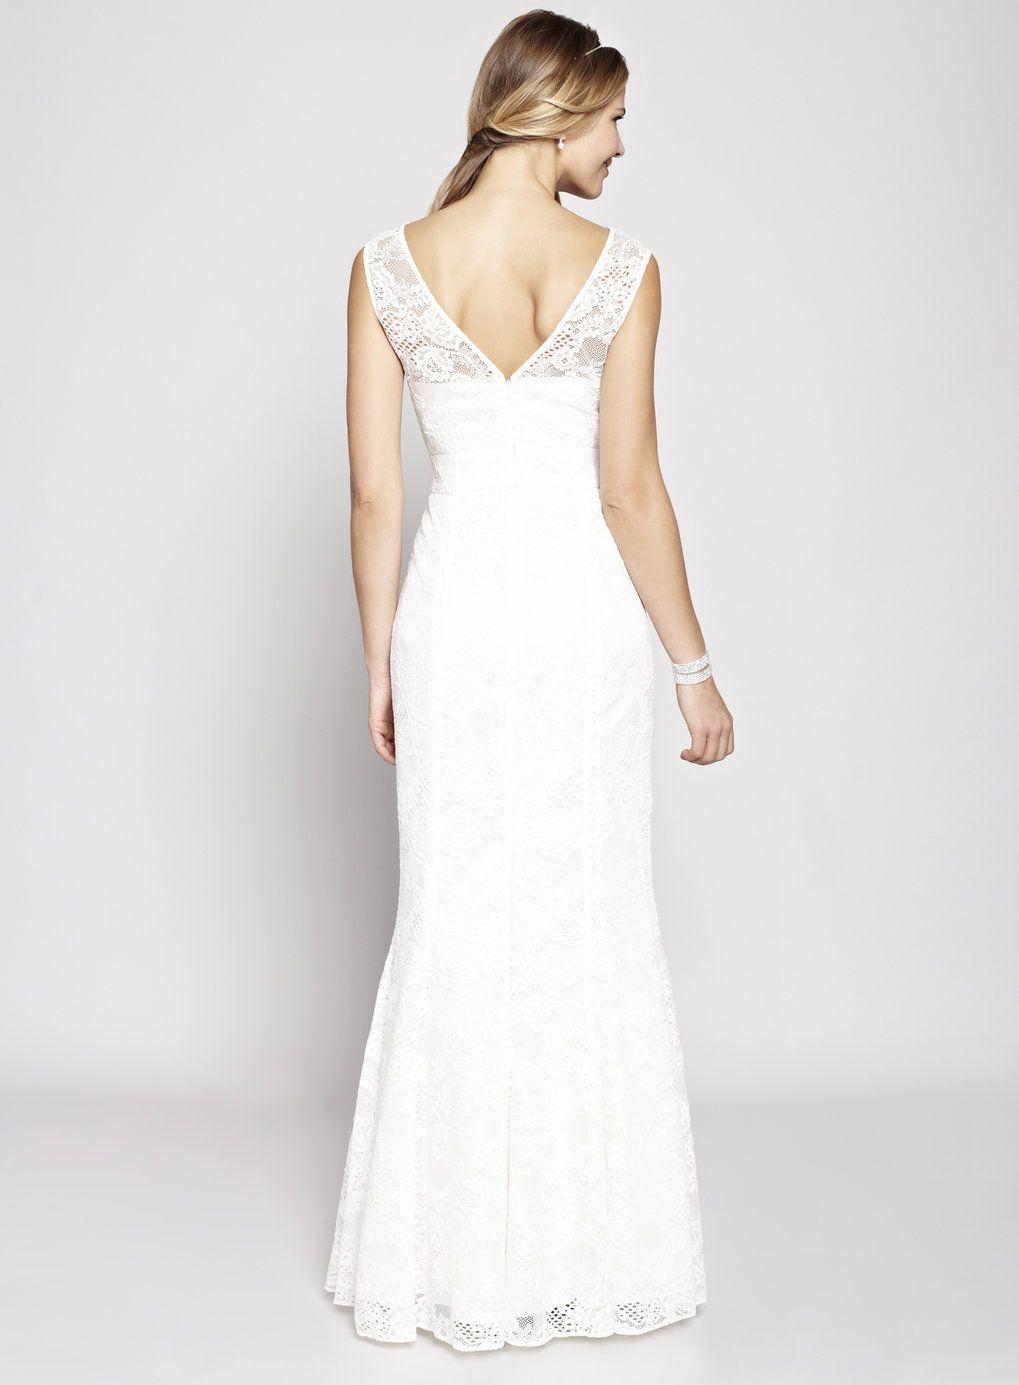 Ivory Florence Wedding Dress Wedding Dresses Wedding Vestido De Noiva Simples Vestidos Vestido De Noiva